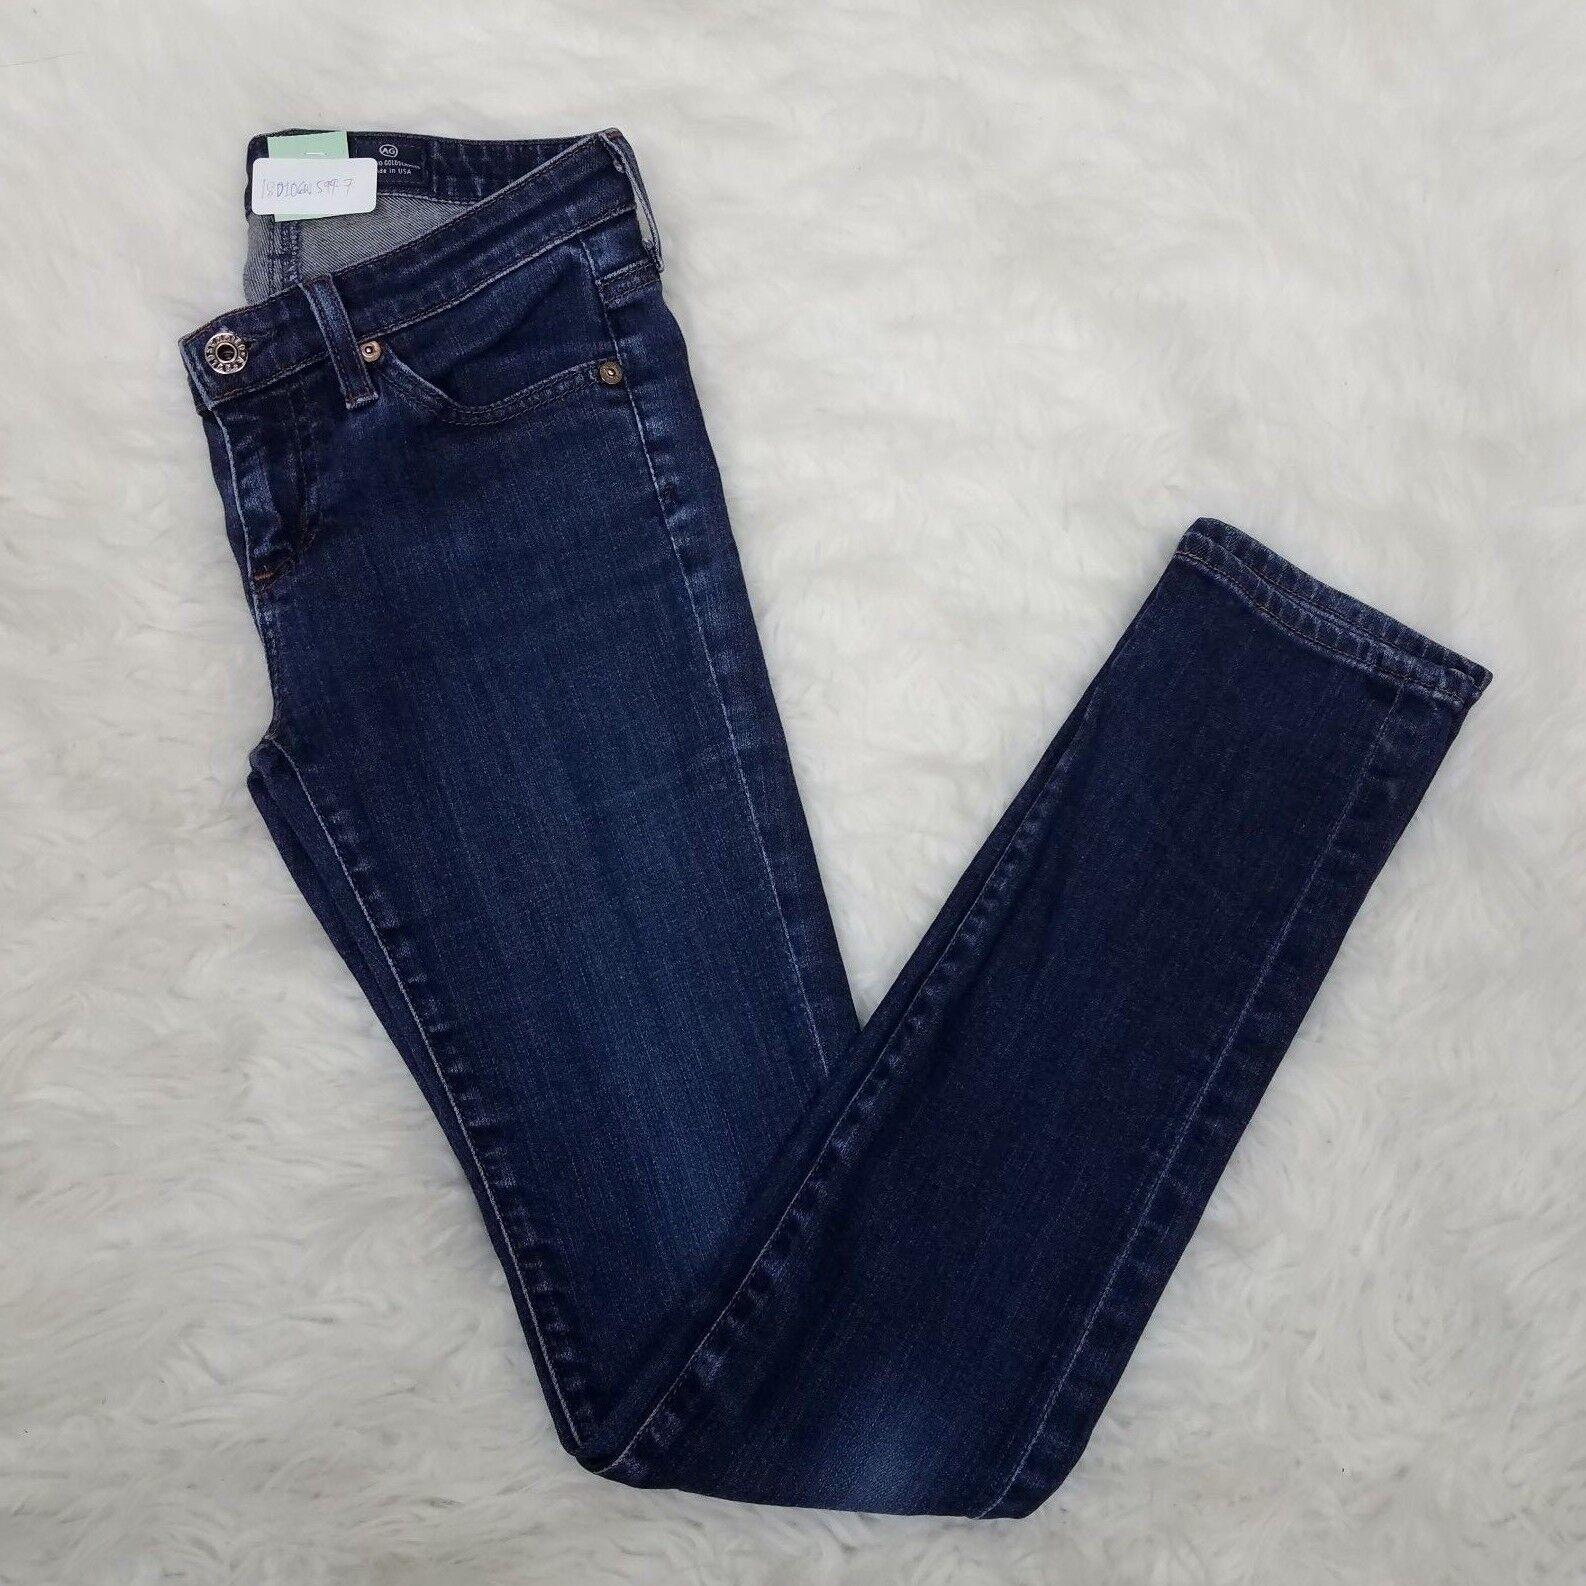 AG Adriano goldschmied Womens Jeans Stevie Slim Straight Sz 25R bluee F4